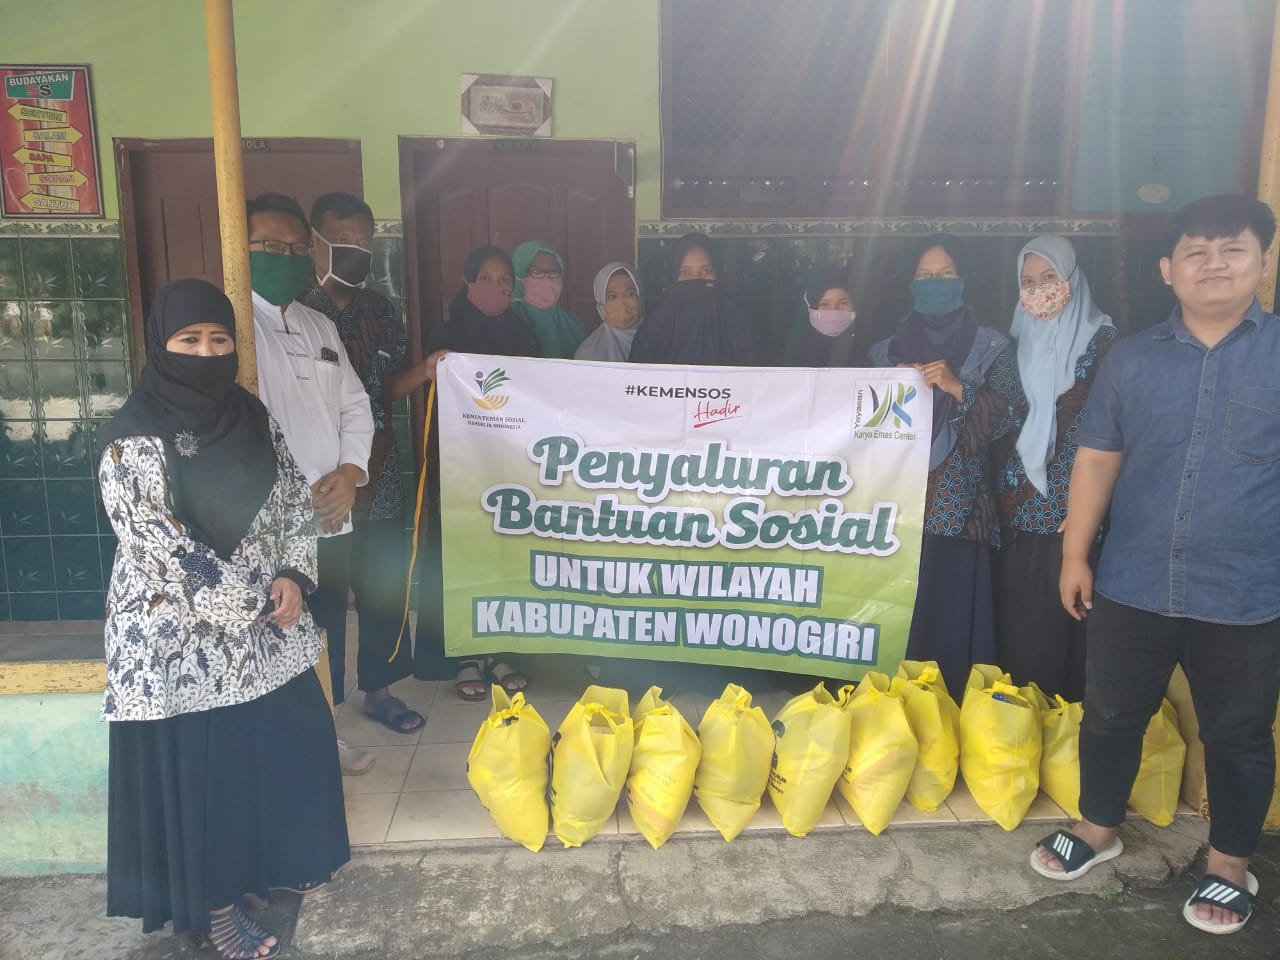 Serap Aspirasi dan Bagi Sembako, Endang Maria Astuti Sambangi MI Muhammadiyah Danan Giriwoyo